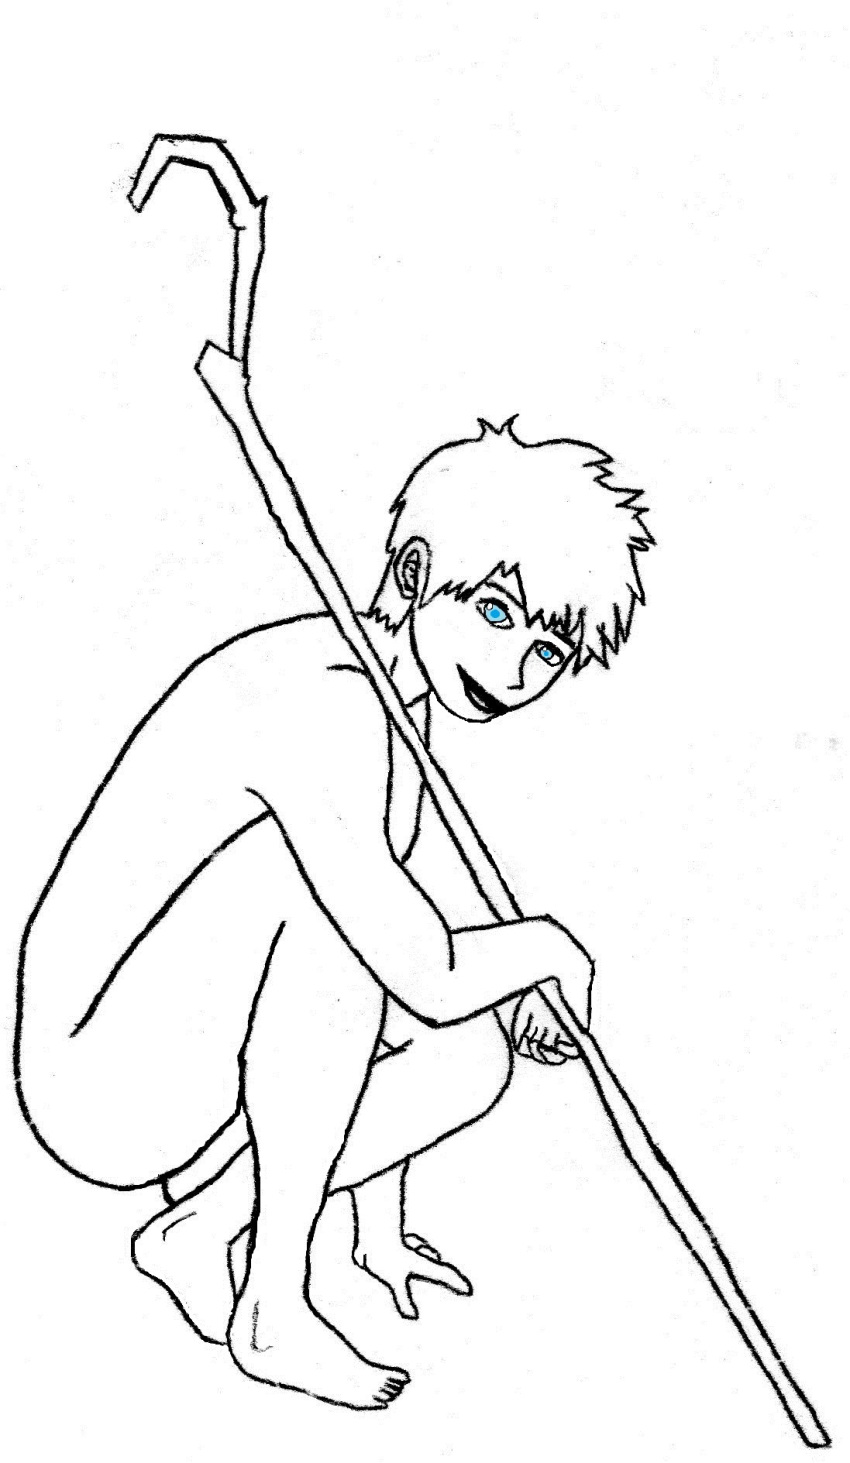 the jack rise thin fanfiction of guardians Joshiochi!: 2-kai kara onnanoko ga... futtekita